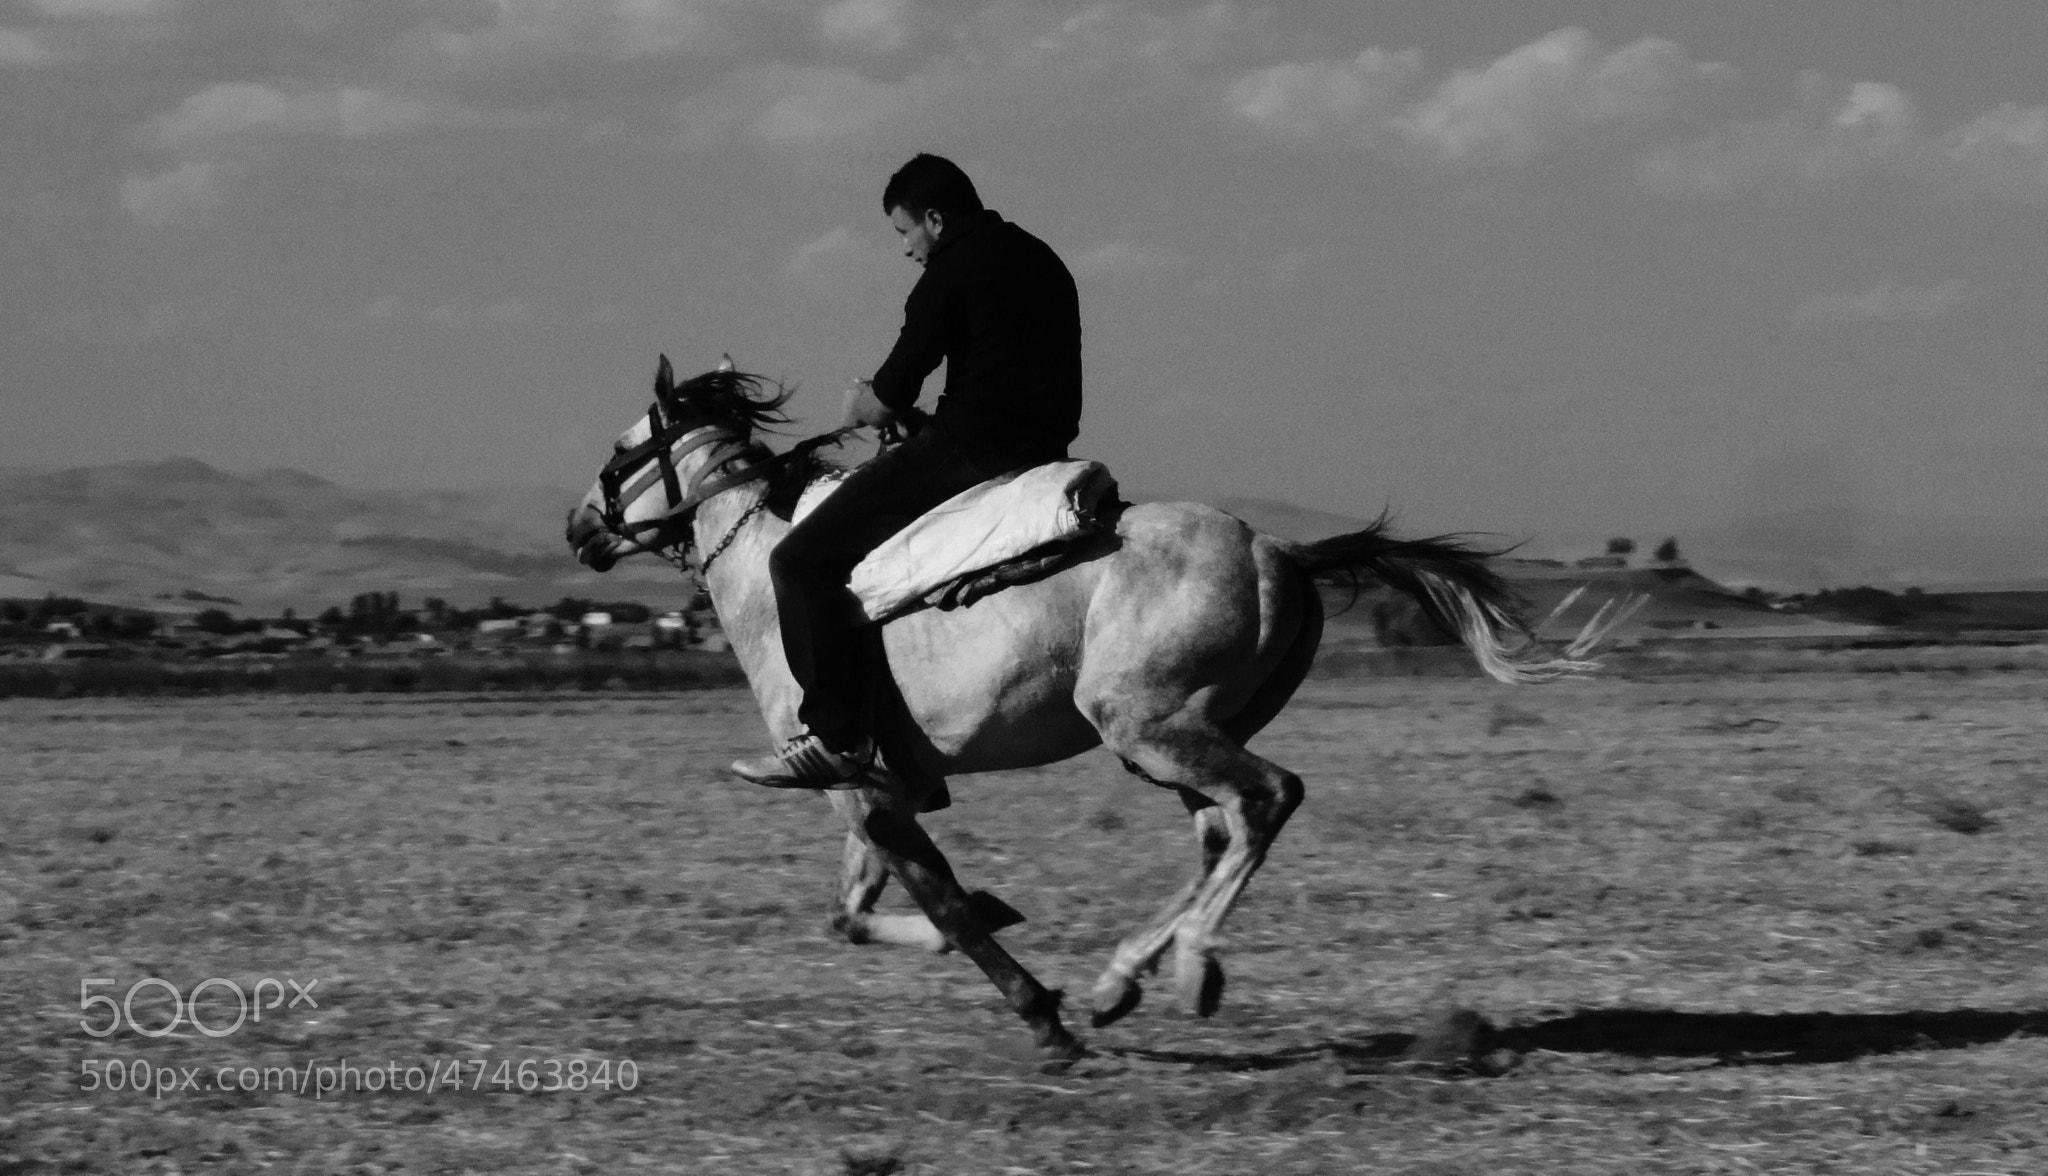 Photograph Riding Horse by Cihan Koç on 500px